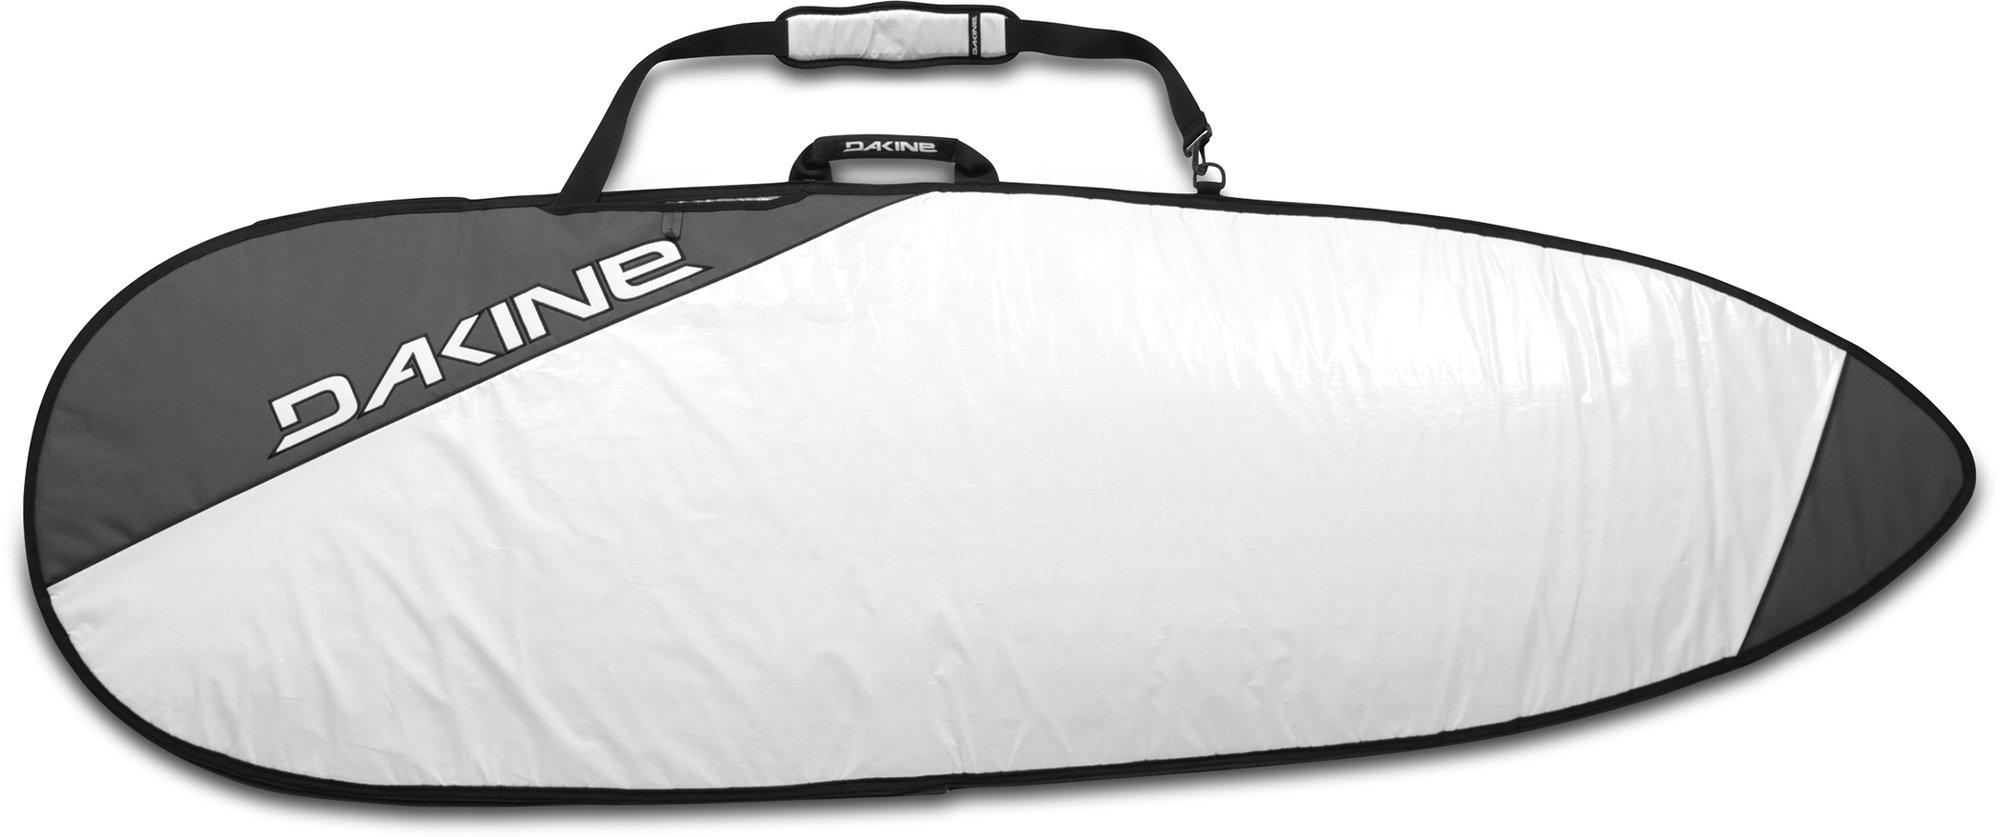 Dakine-Daylight Surf Thruster